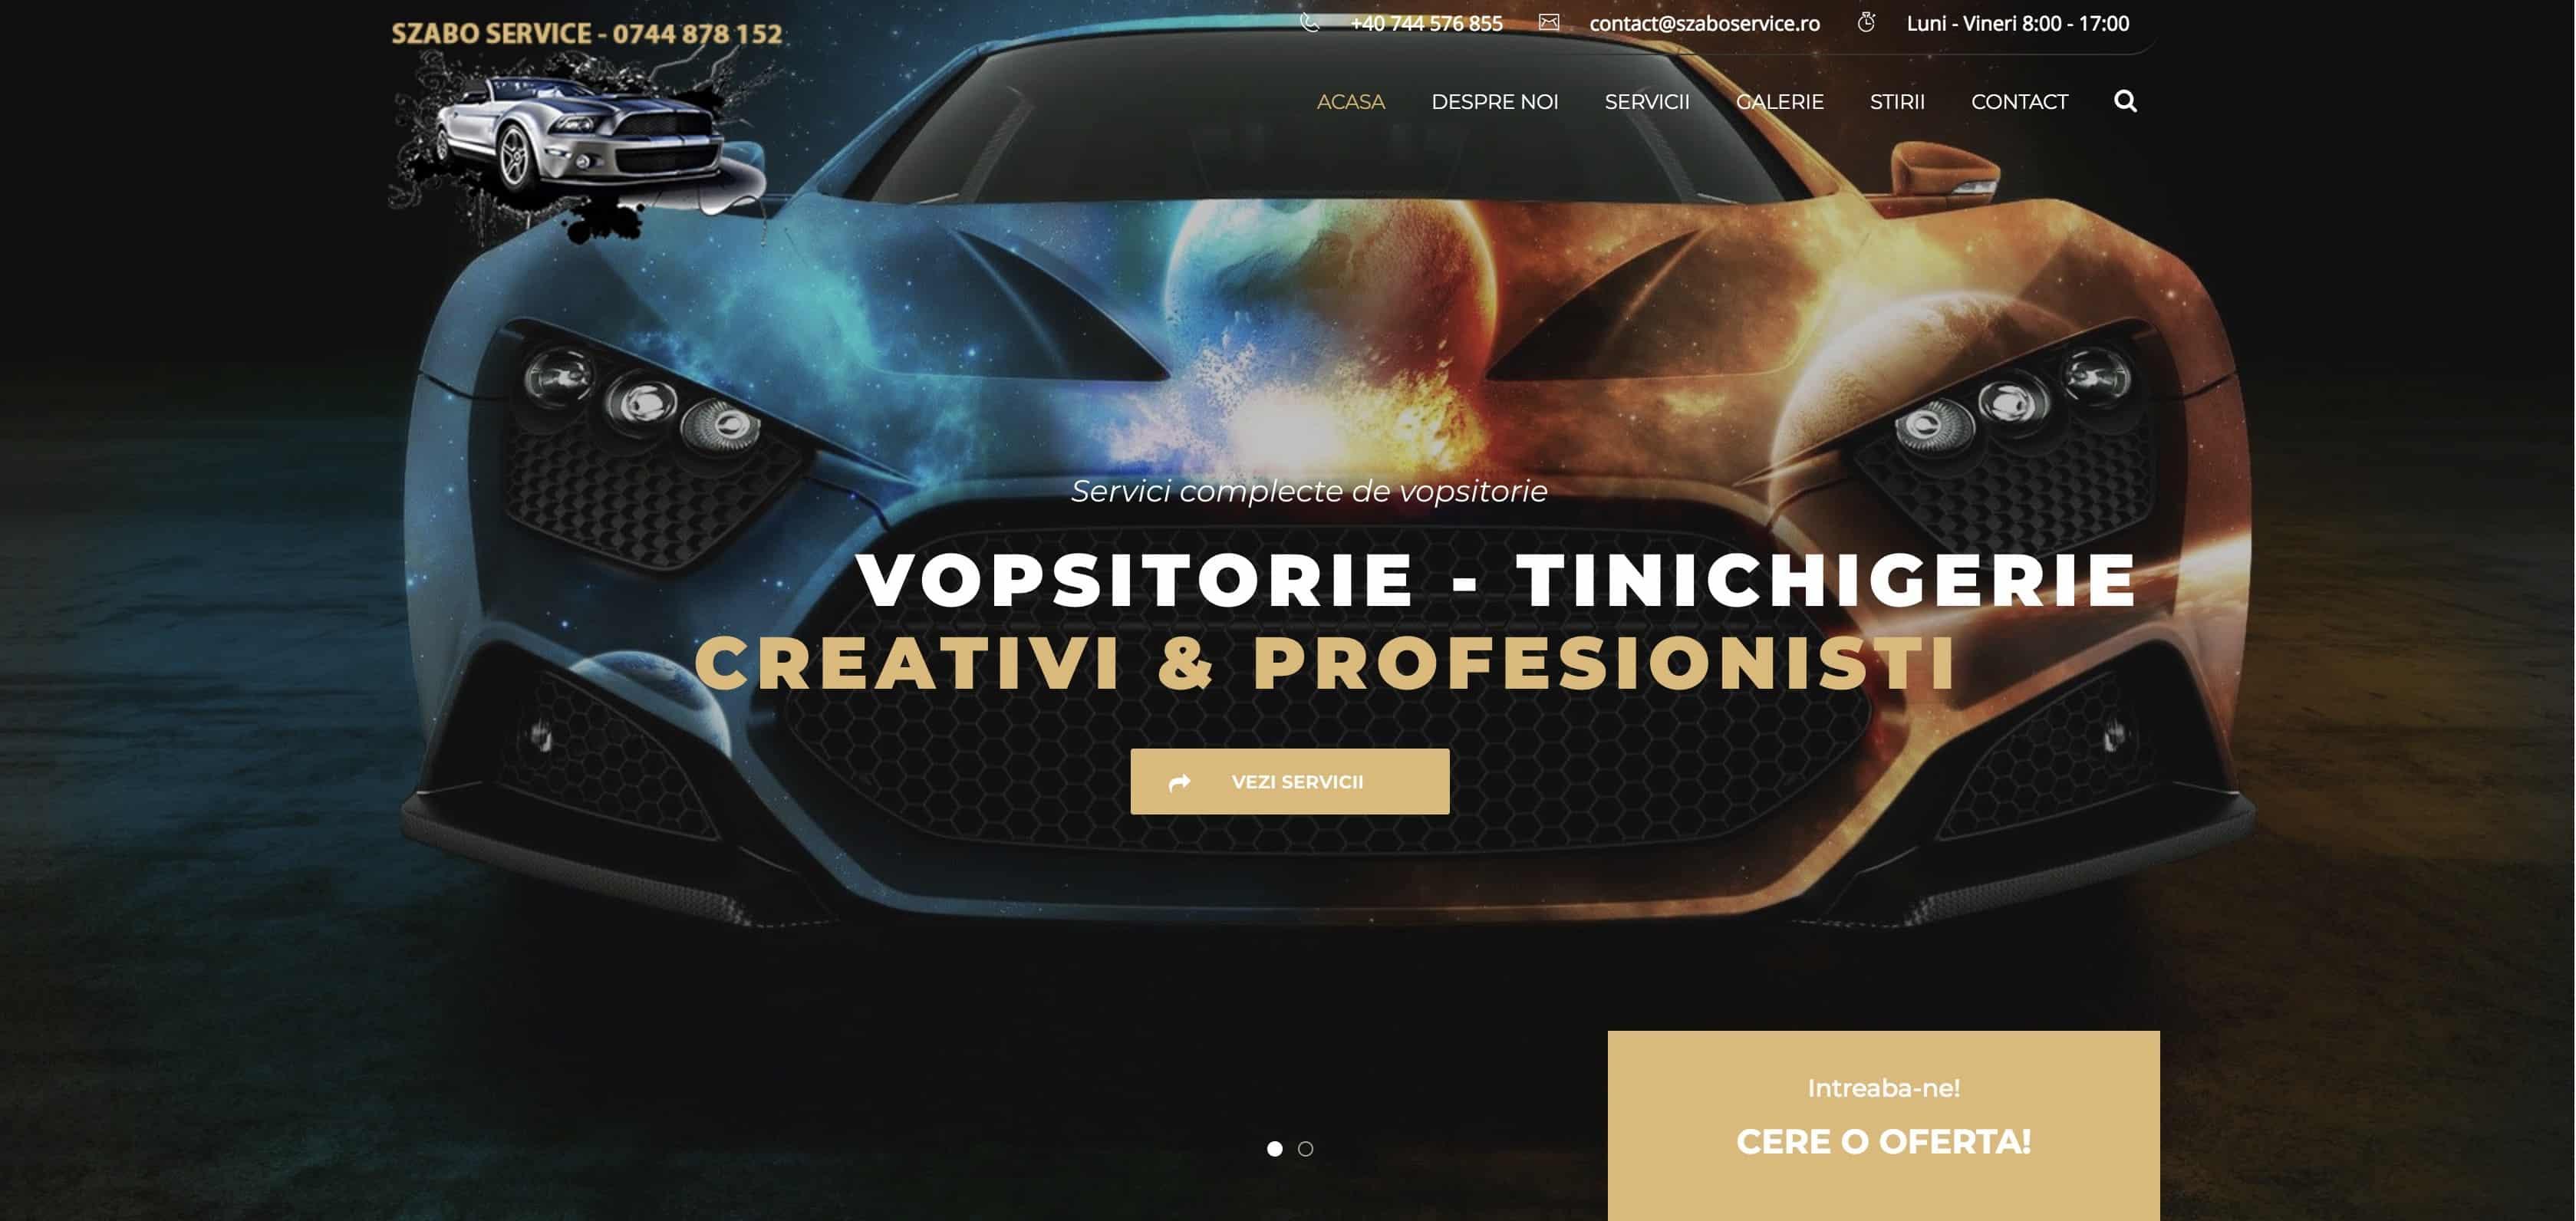 CleanPC Zalau SzaboService Web Design